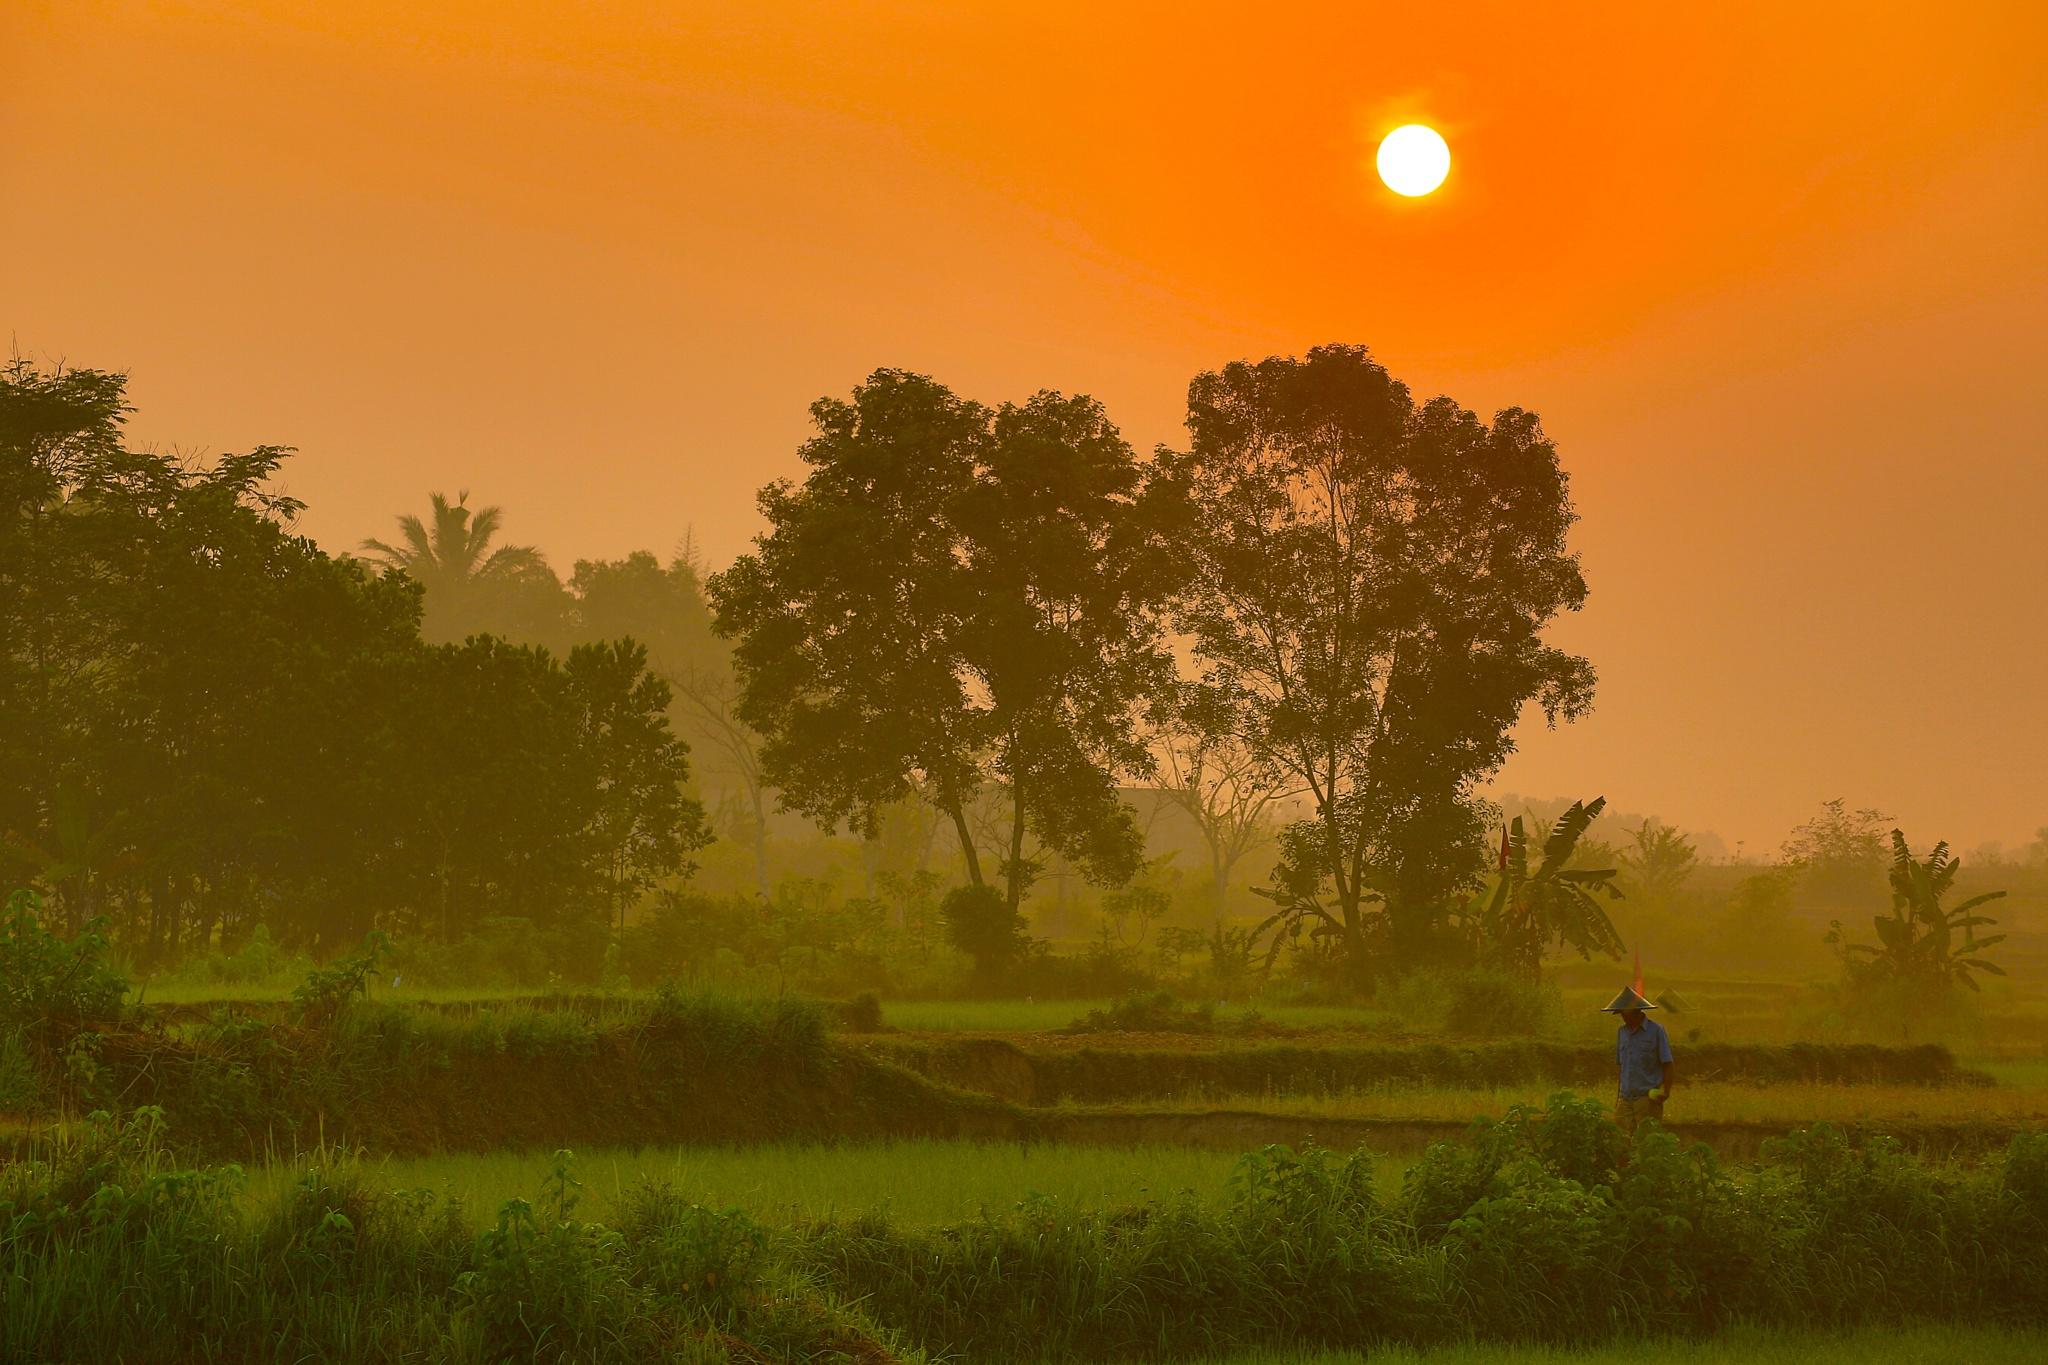 The Farmer in early morning by herrylebran